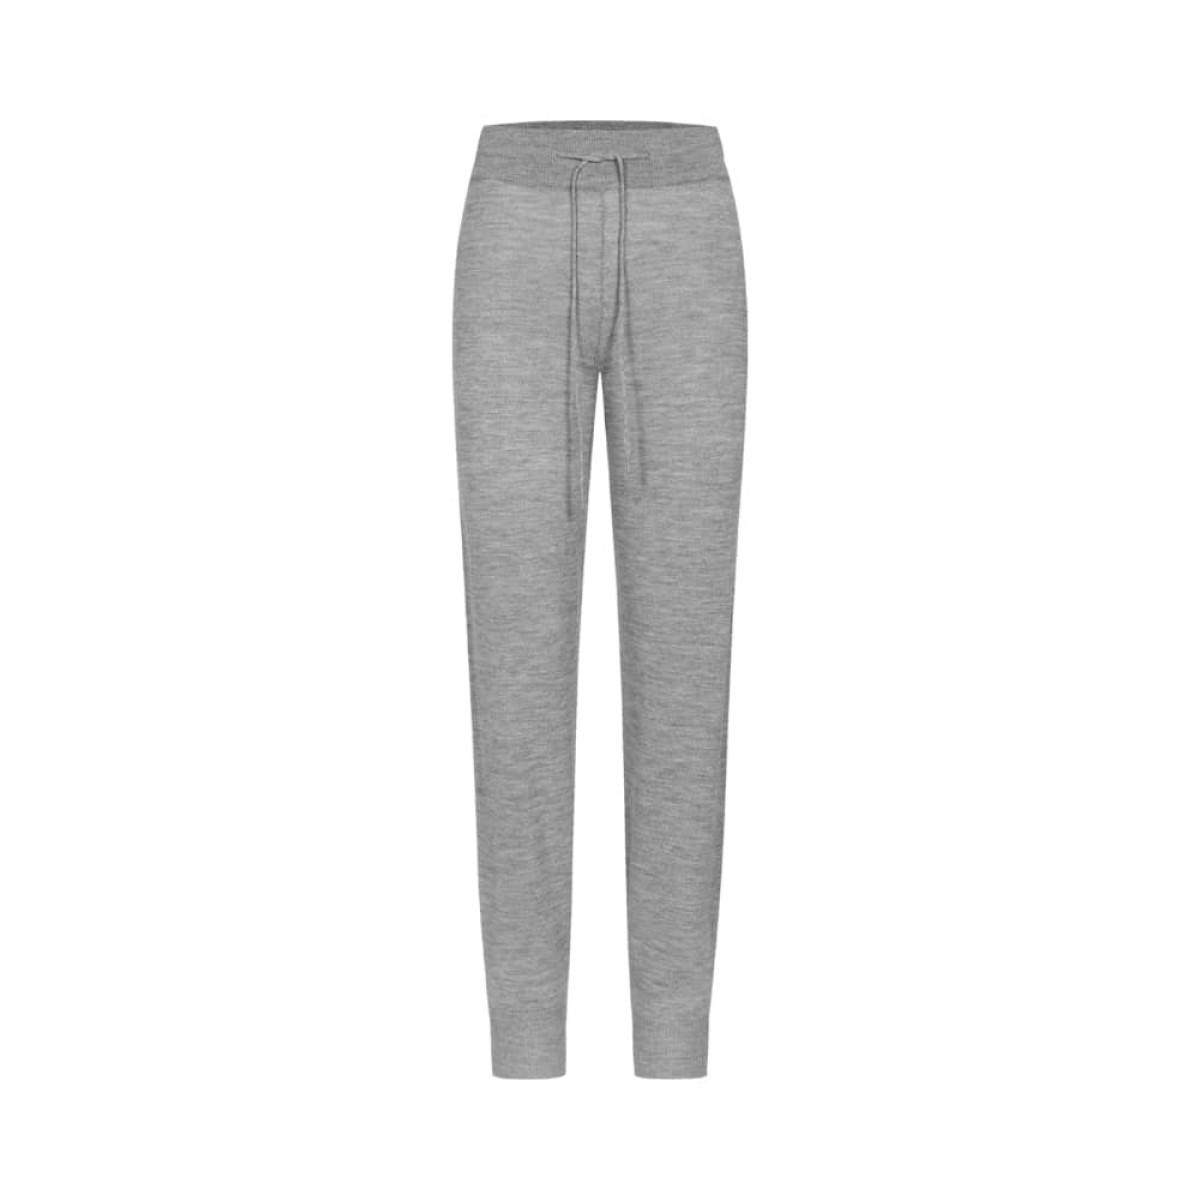 karina pants - grey melange - front